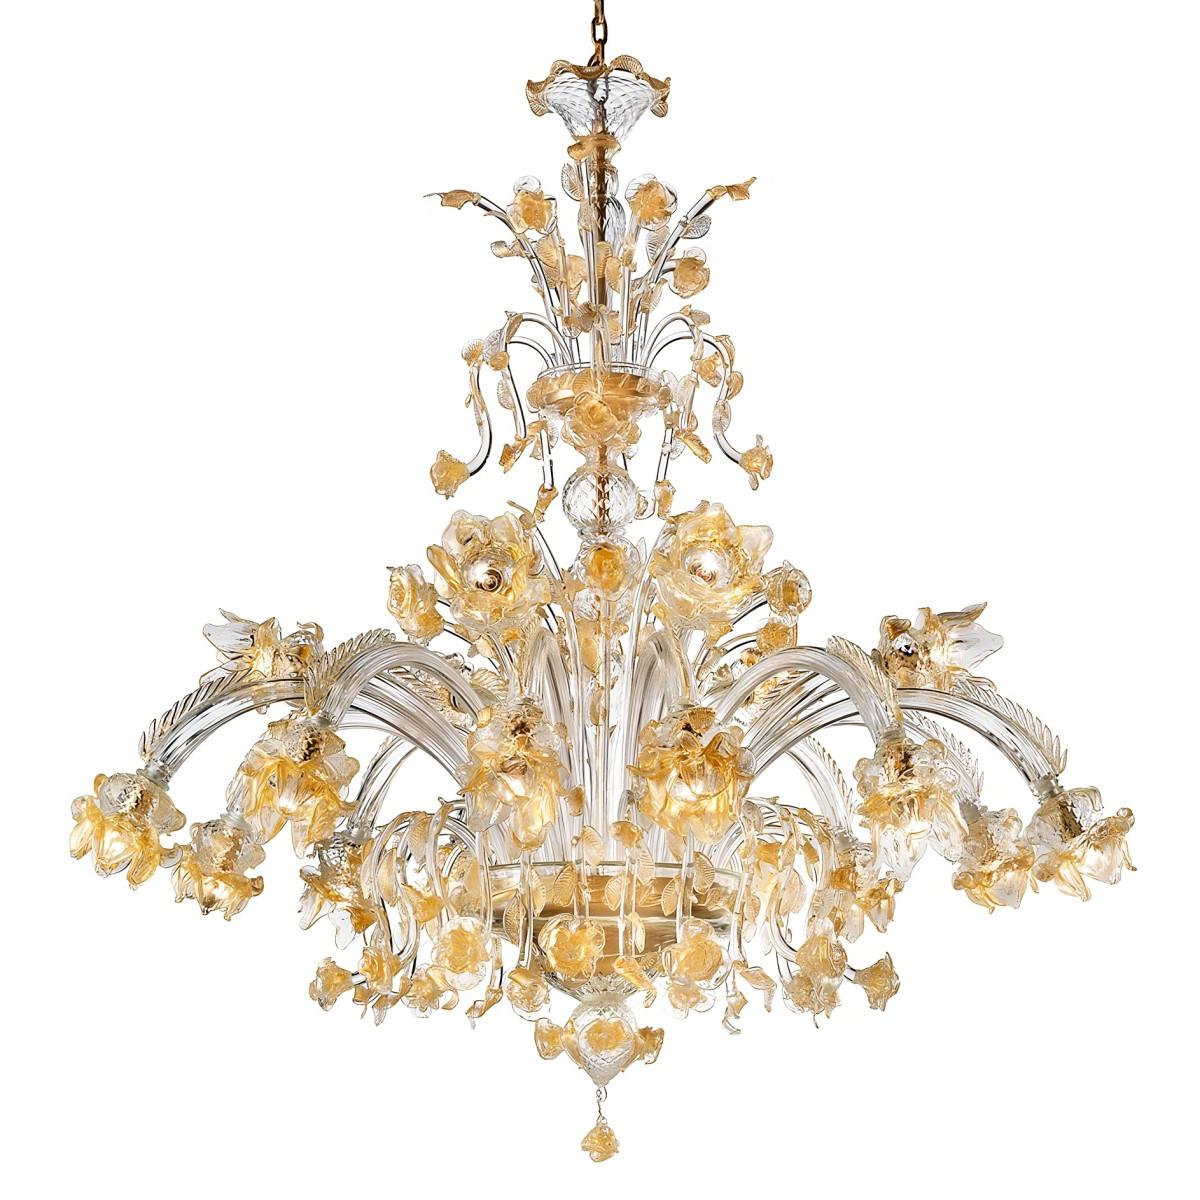 """Rose Dorate"" lampara de cristal de Murano - 12+6 luces - transparente y oro"